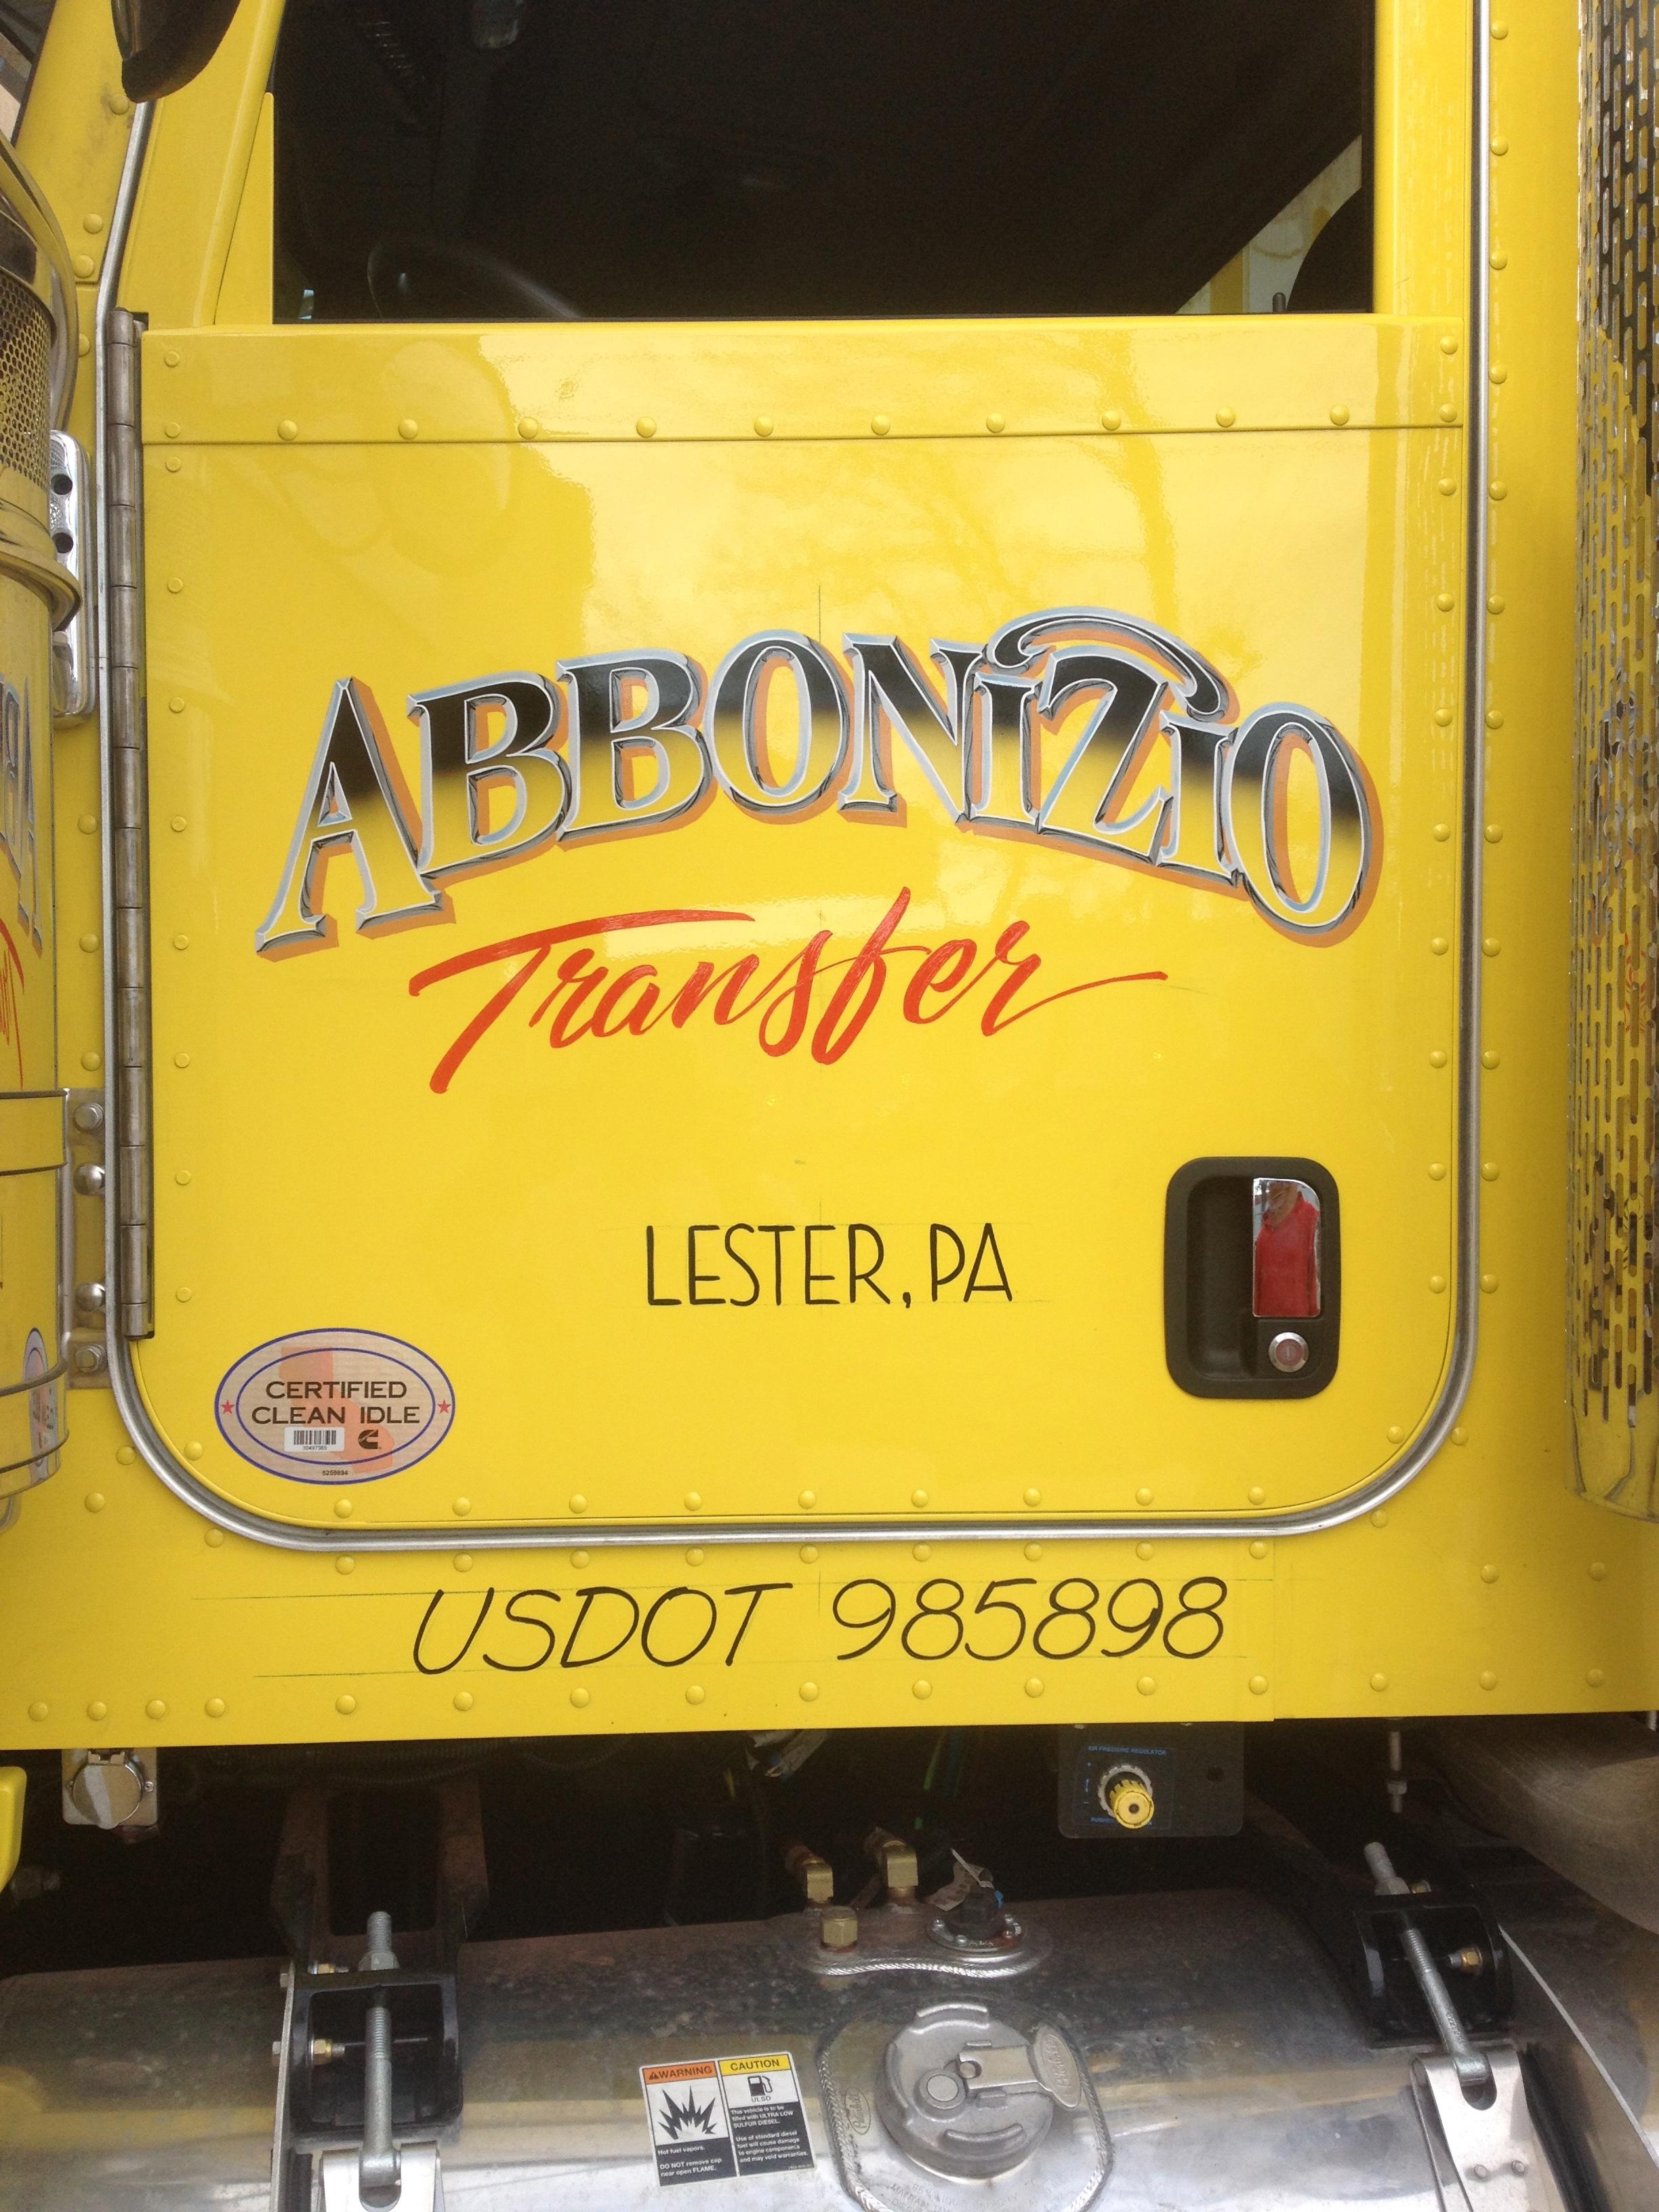 Truck Lettering Design Brilliance